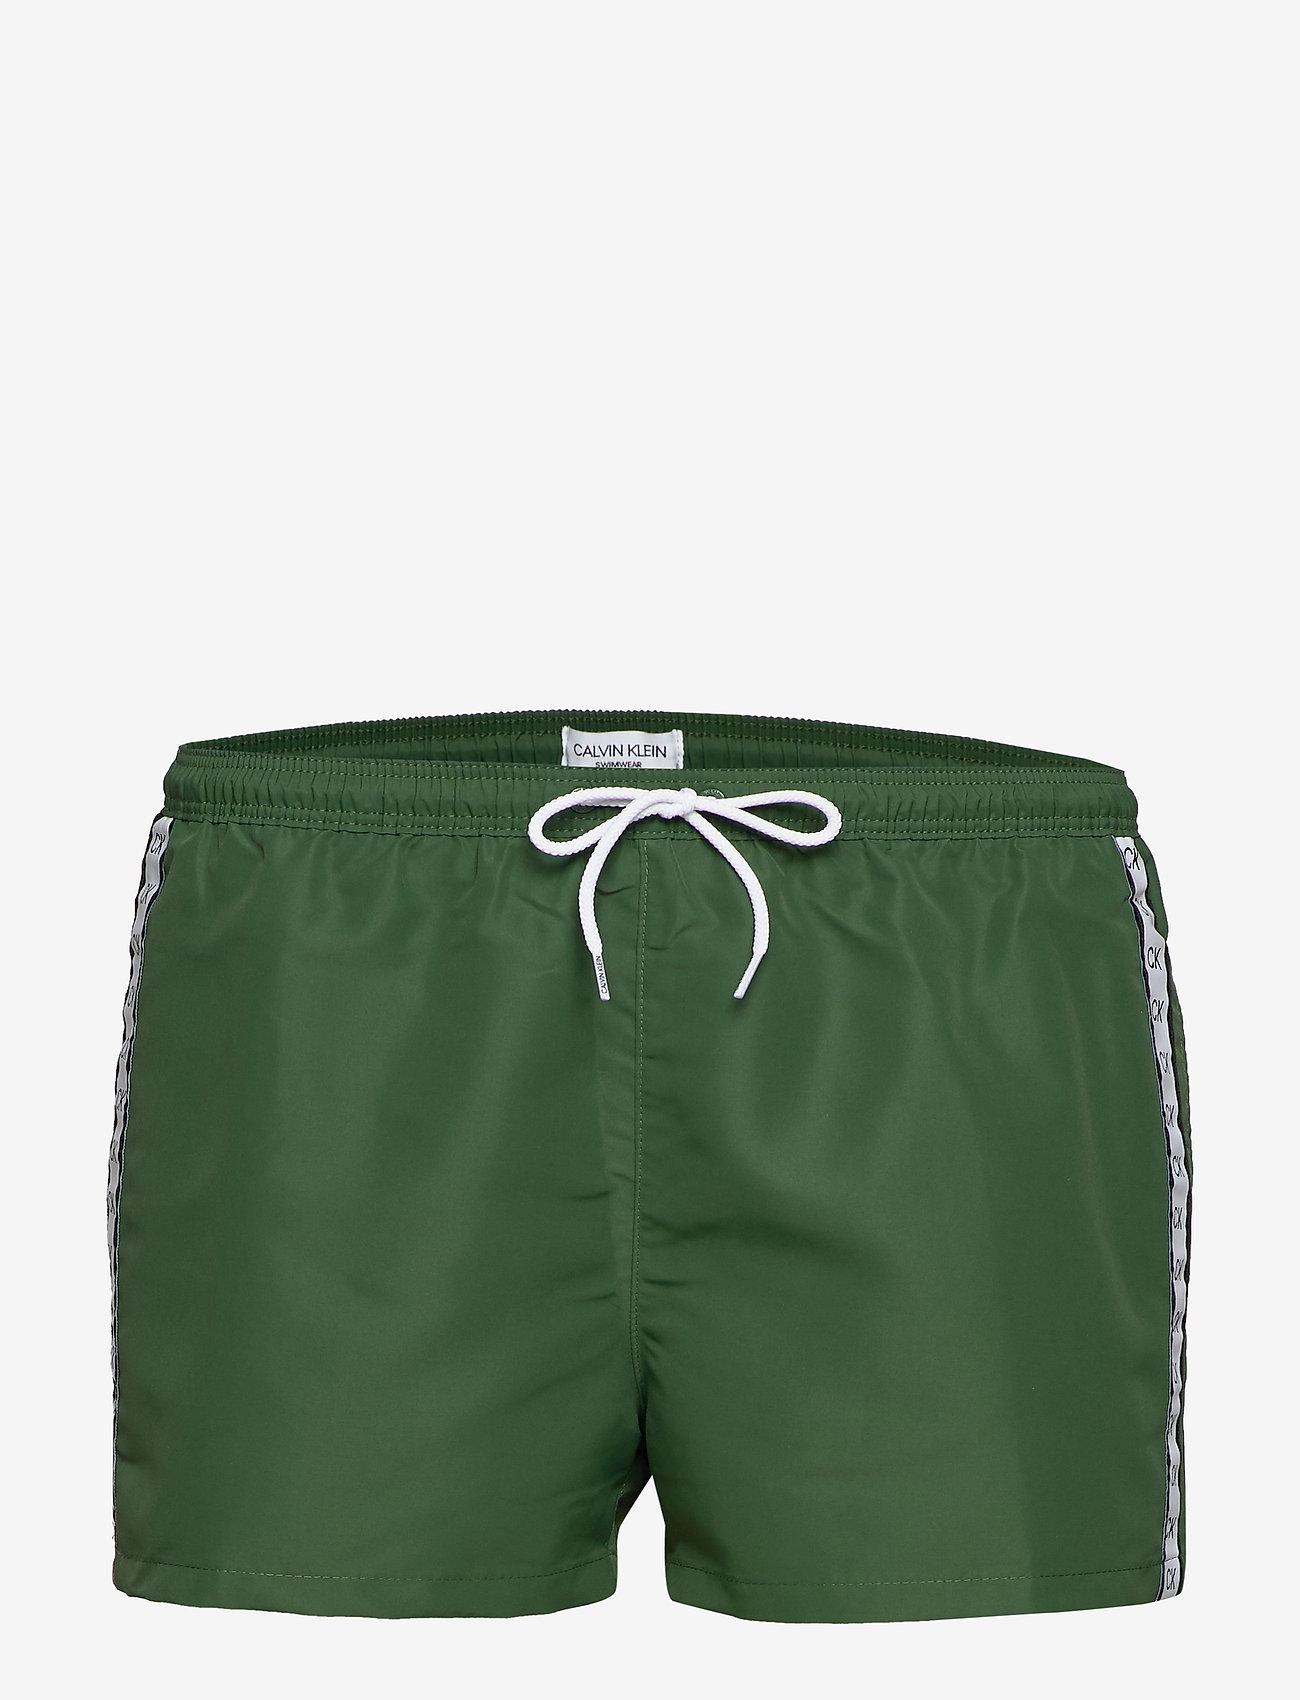 Calvin Klein - SHORT DRAWSTRING - badehosen - dark green - 0